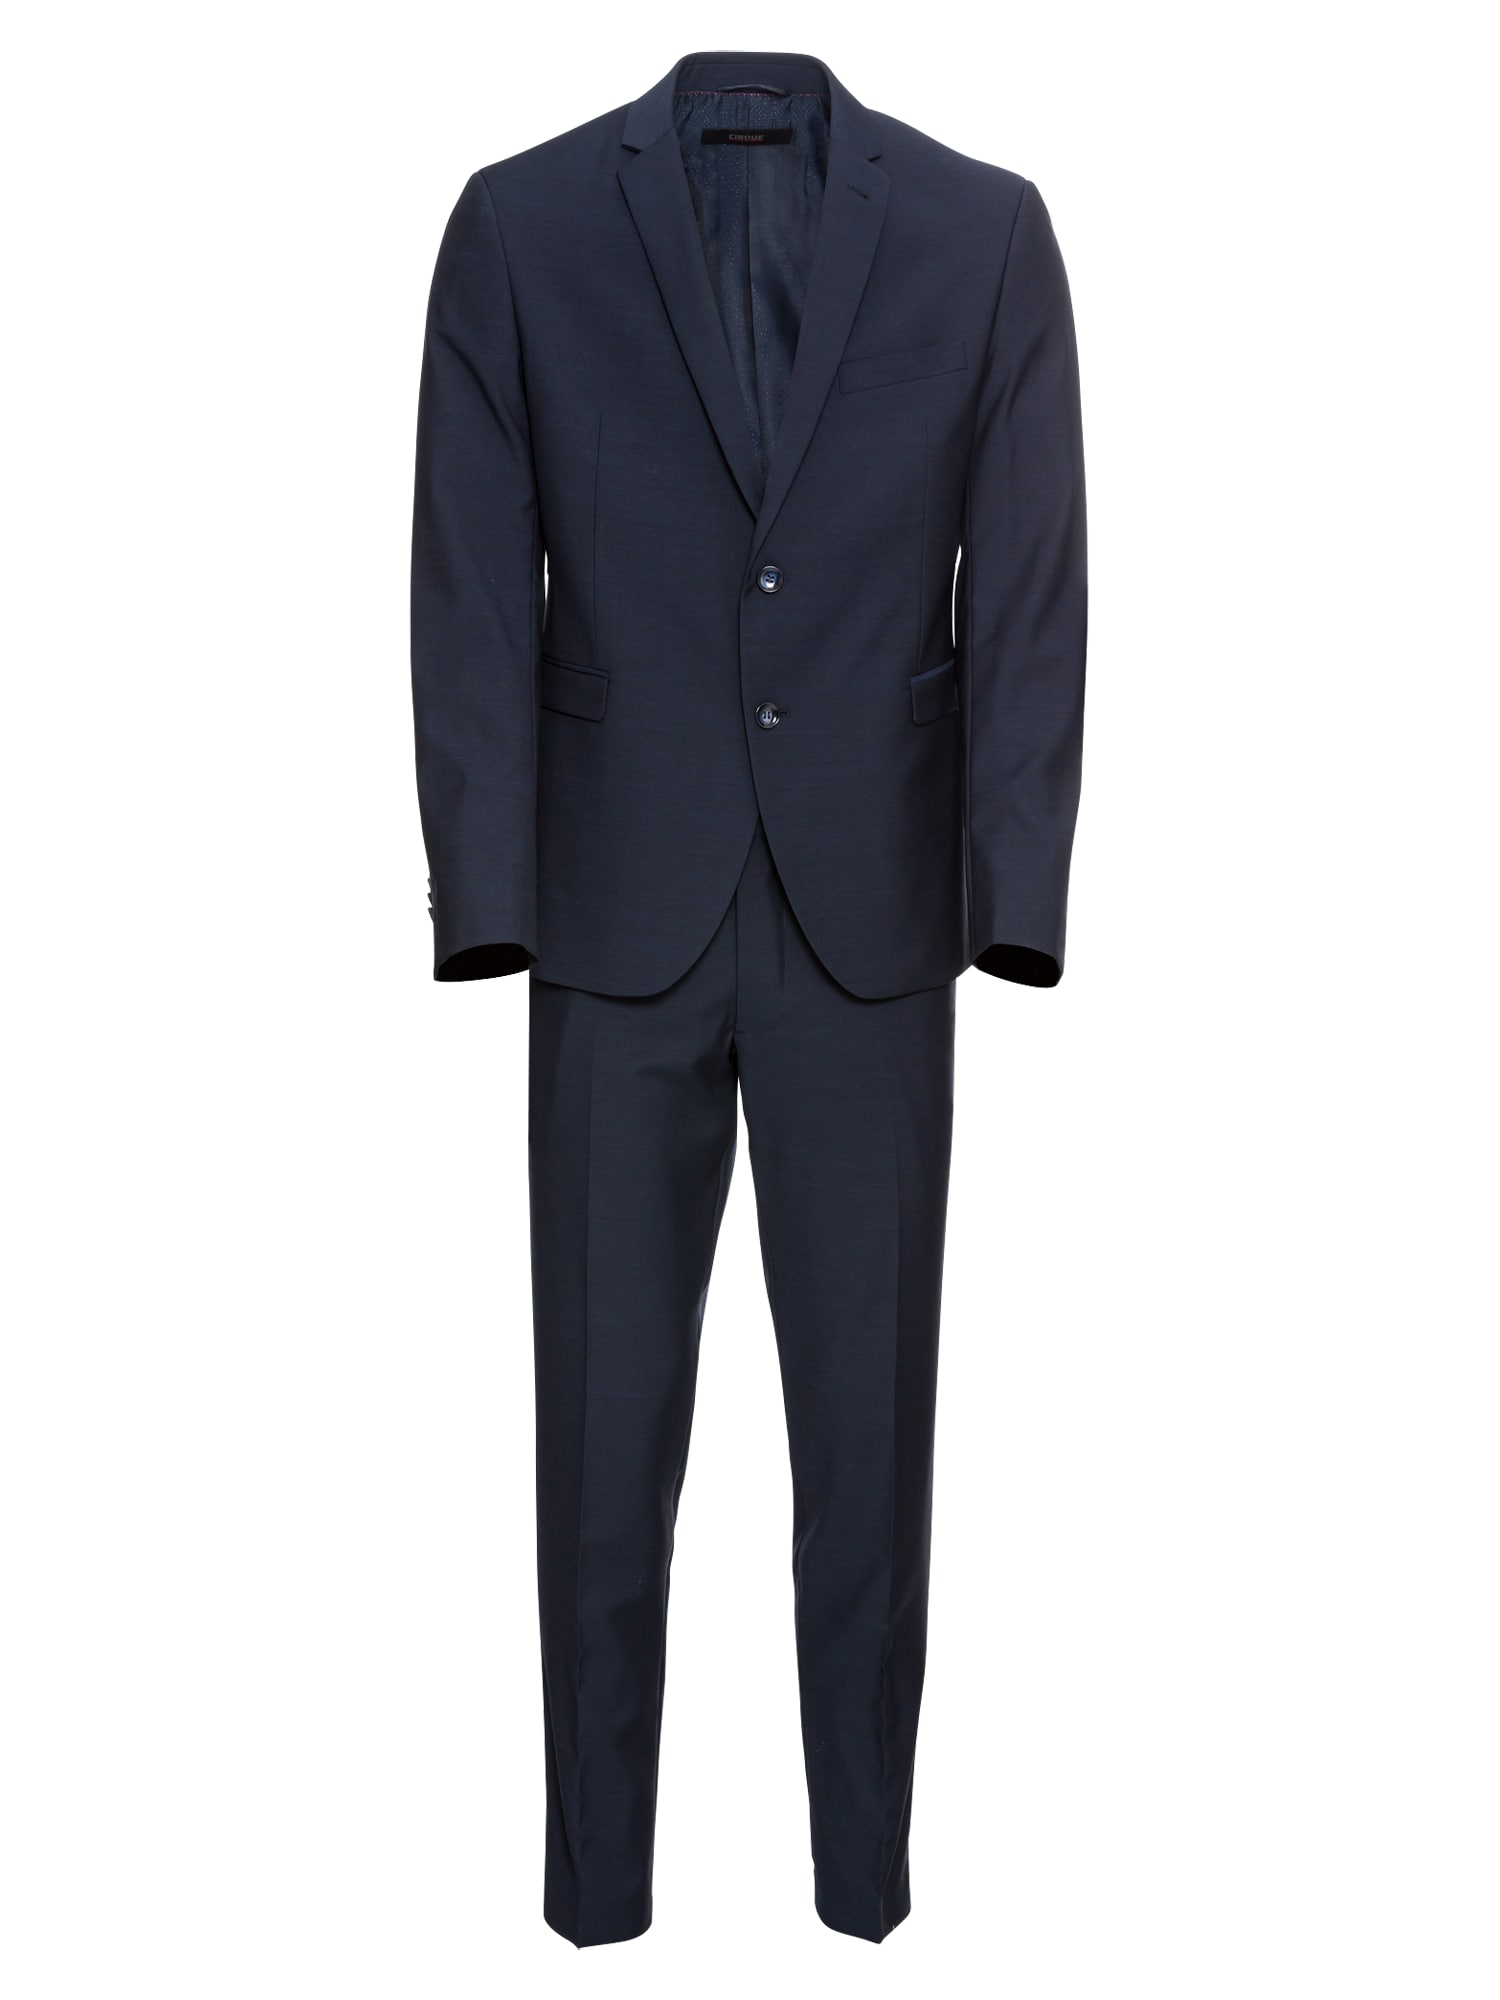 Oblek PULETTI marine modrá CINQUE